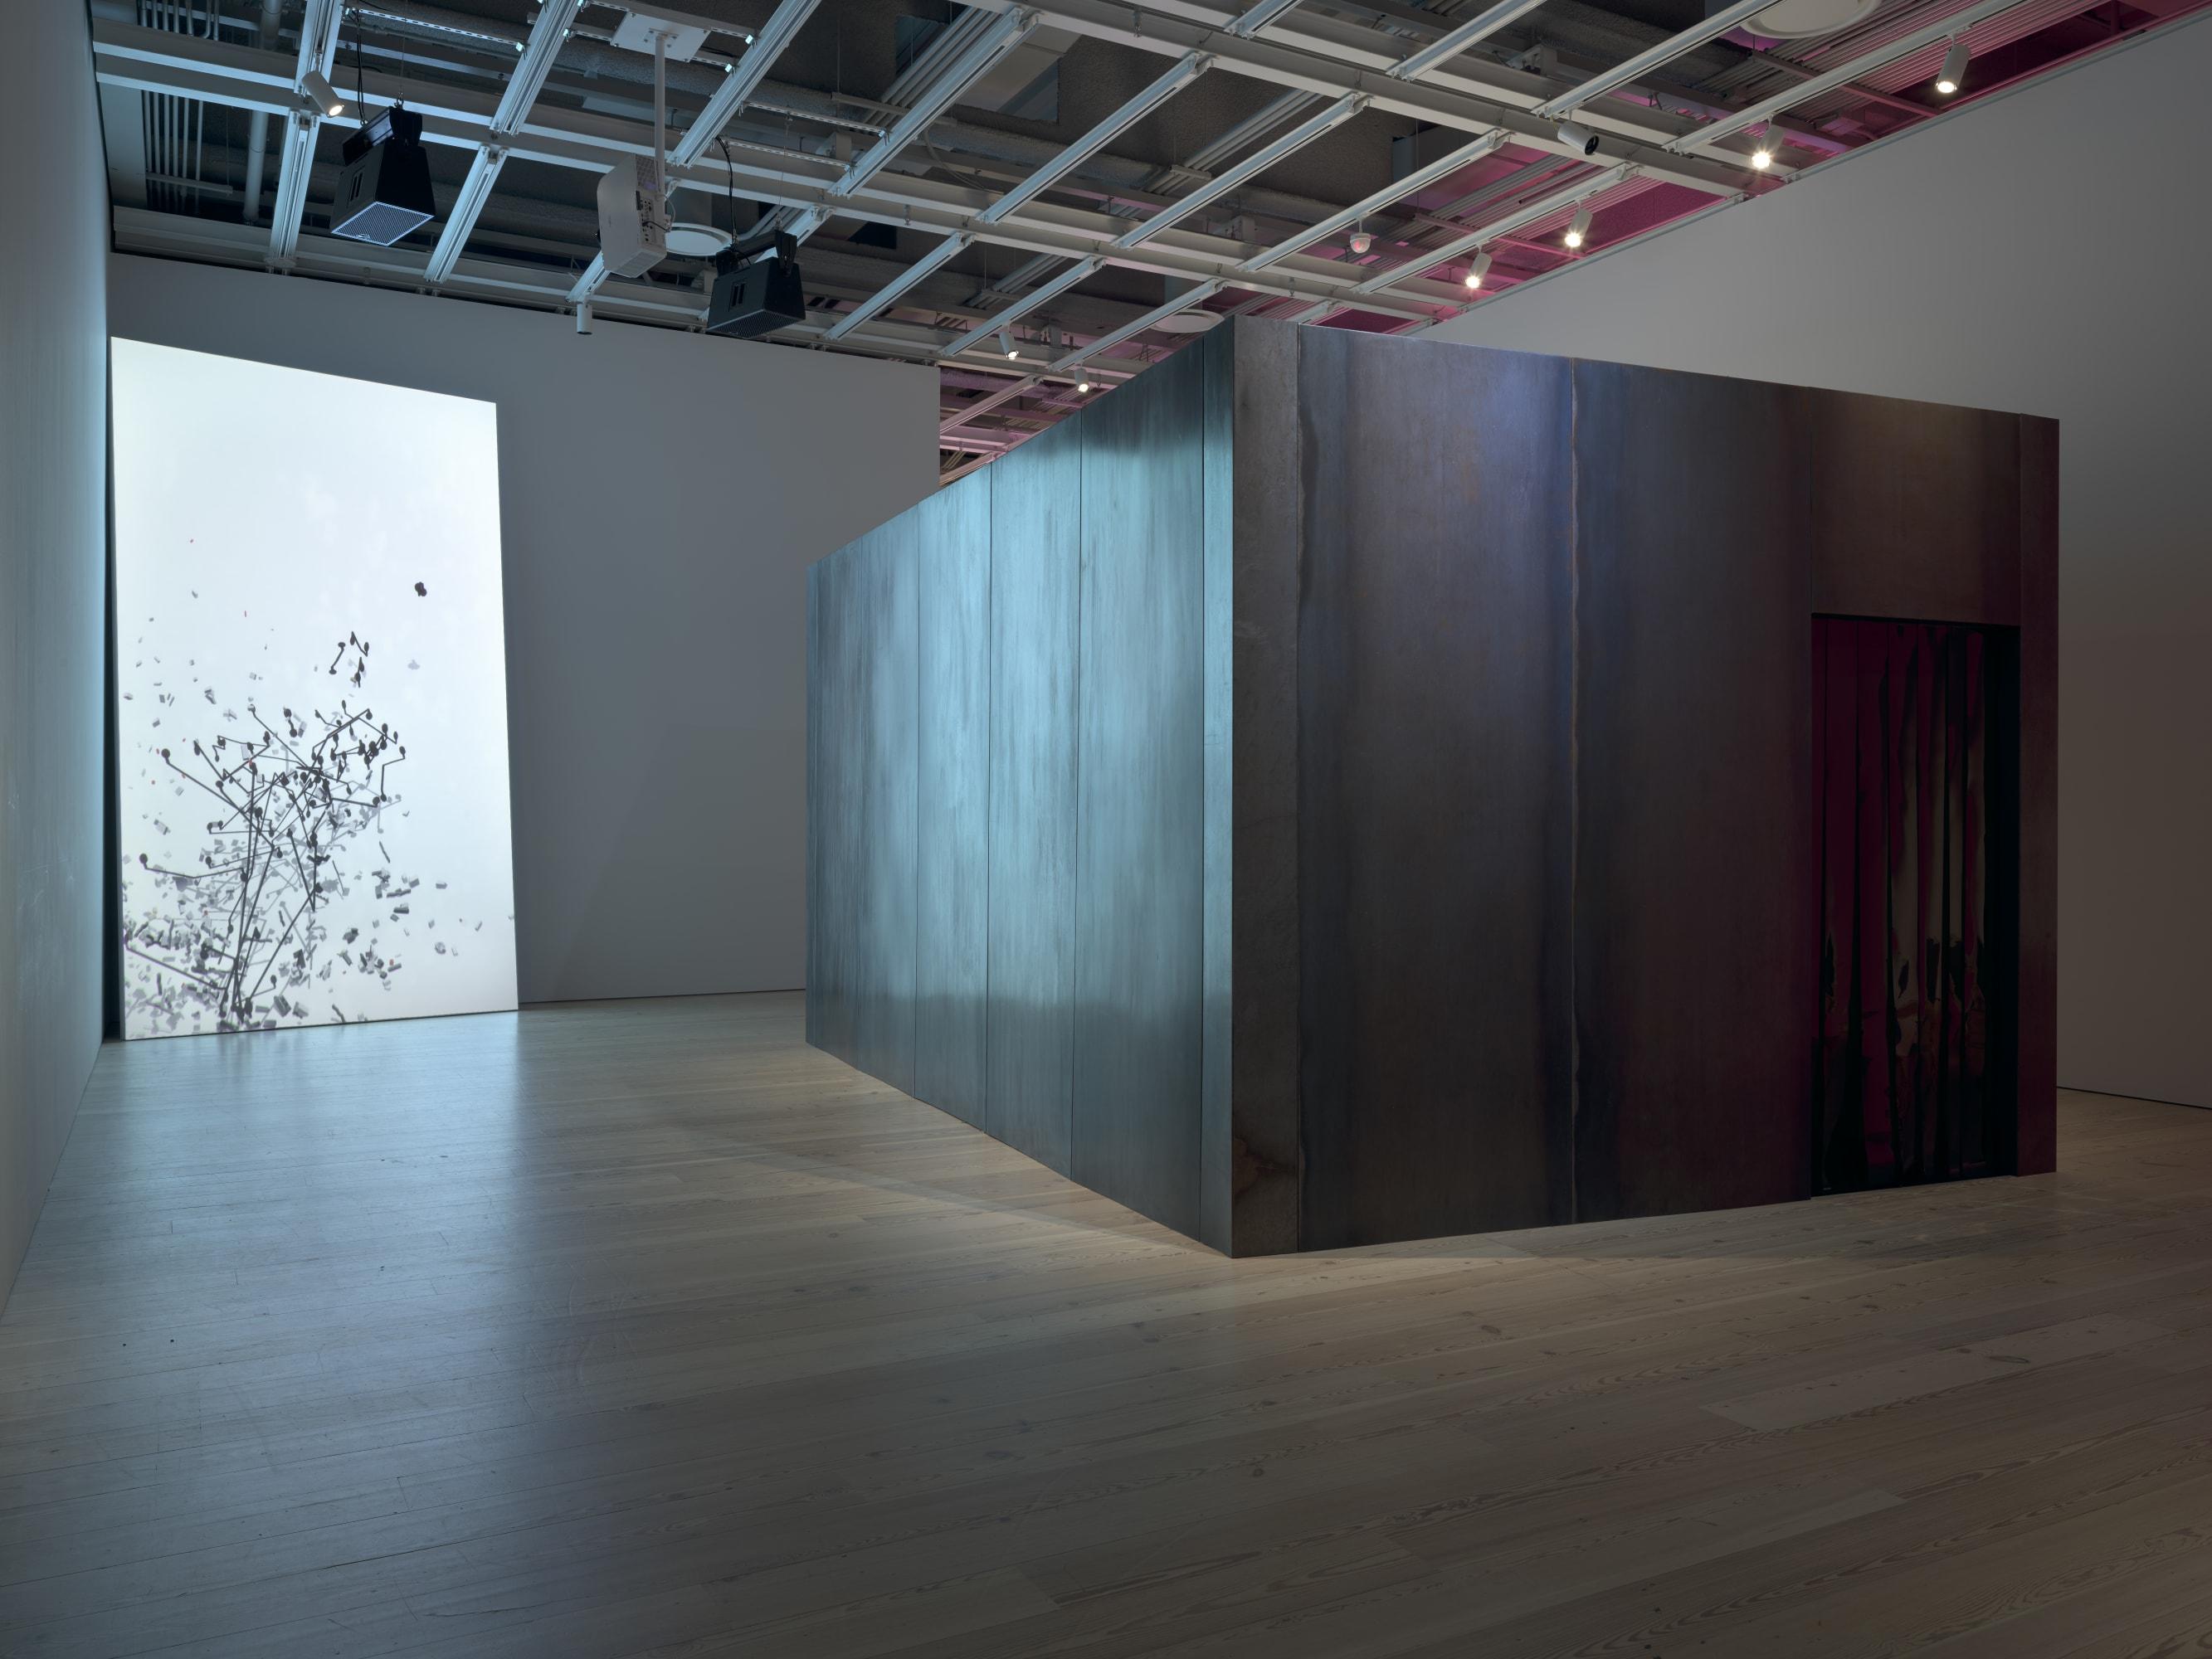 Ian Cheng Dreamlands: Immersive Cinema and Art, 1905 - 2016